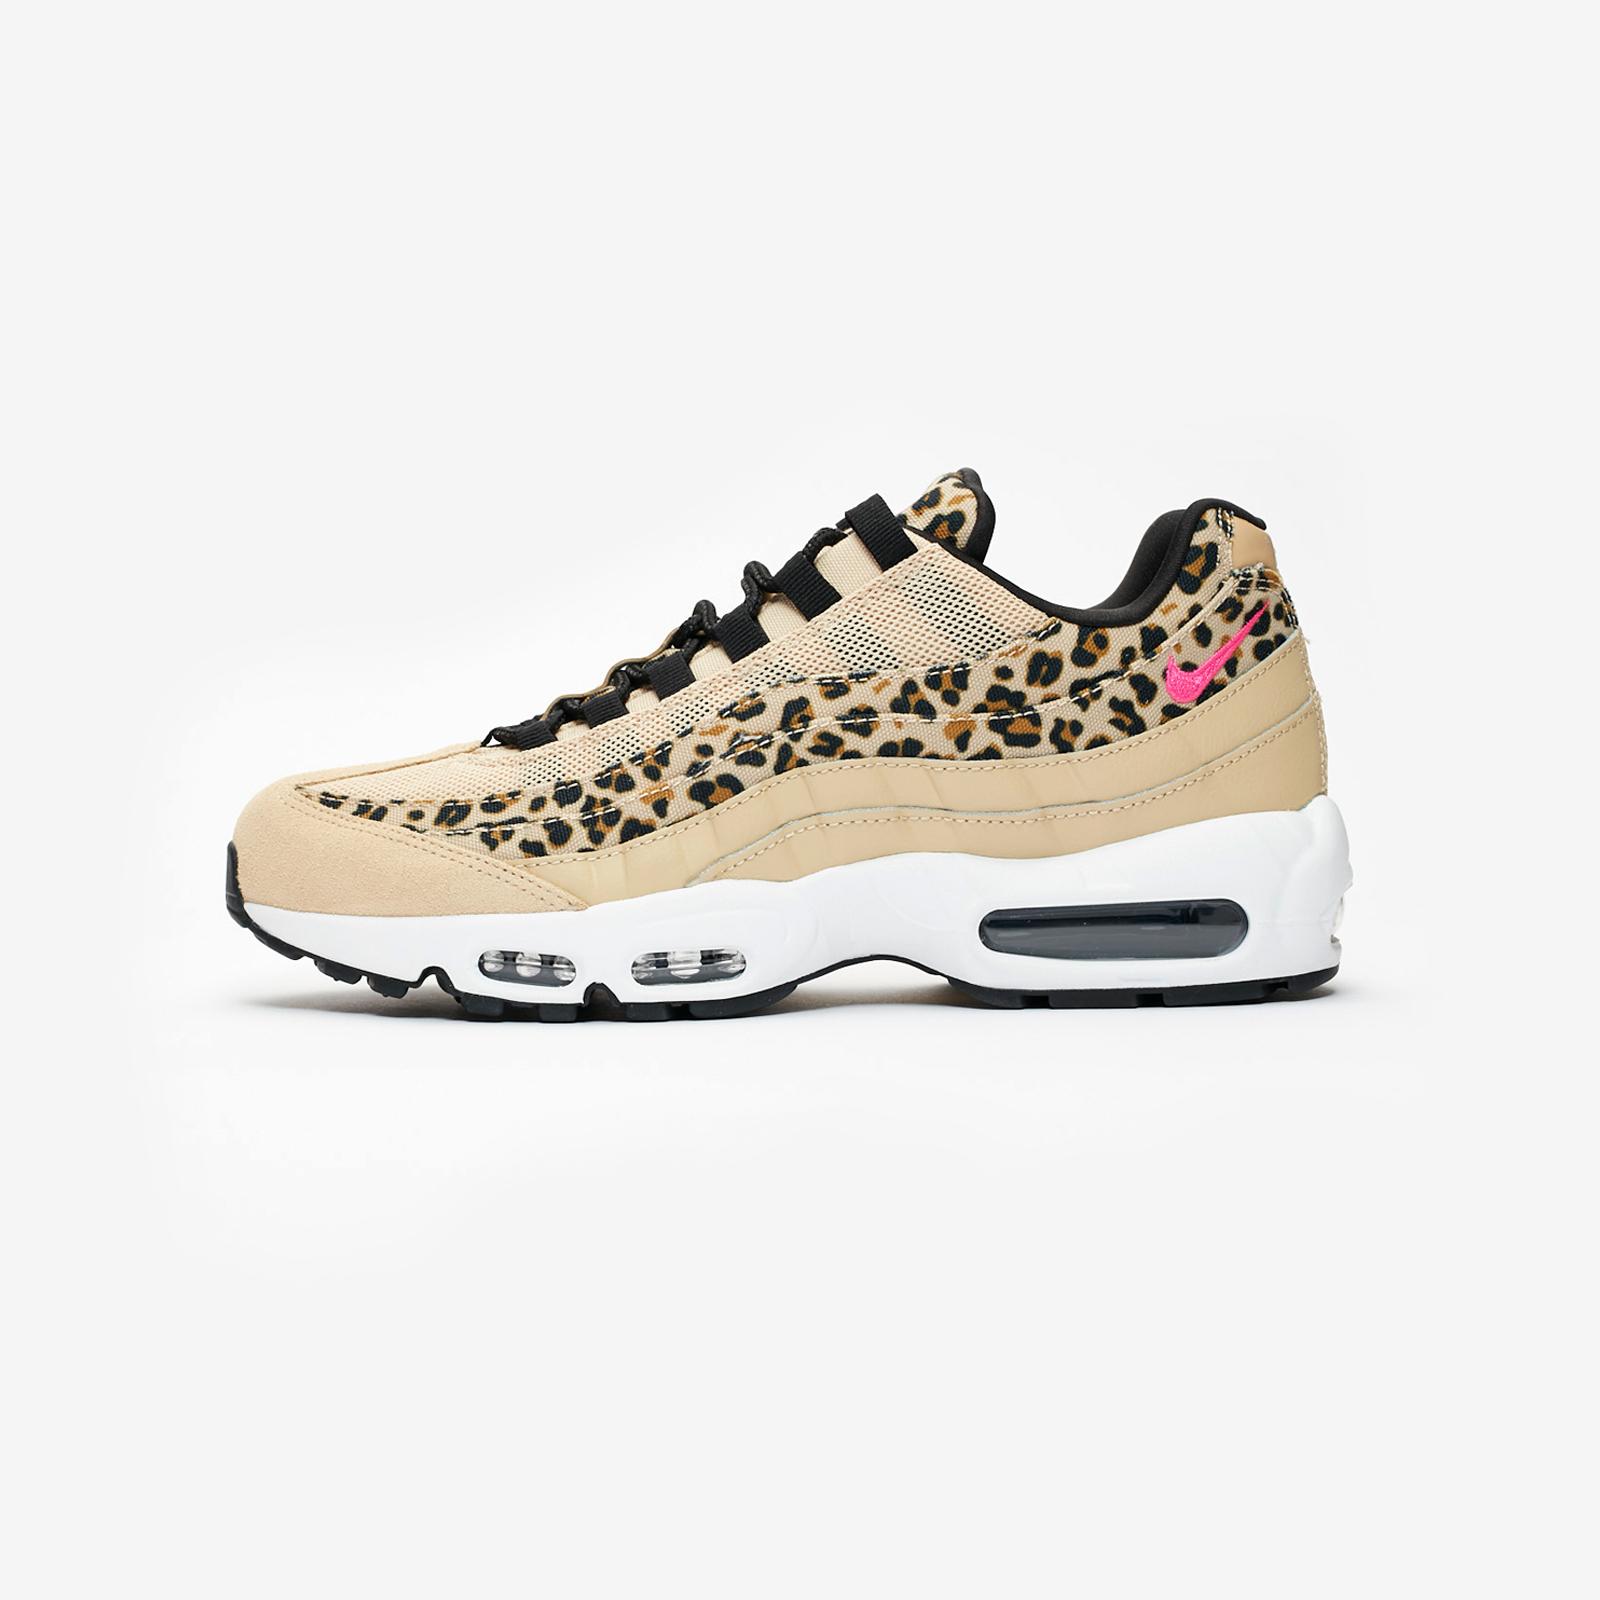 Nike Wmns Air Max 95 Premium Cd0180 200 Sneakersnstuff